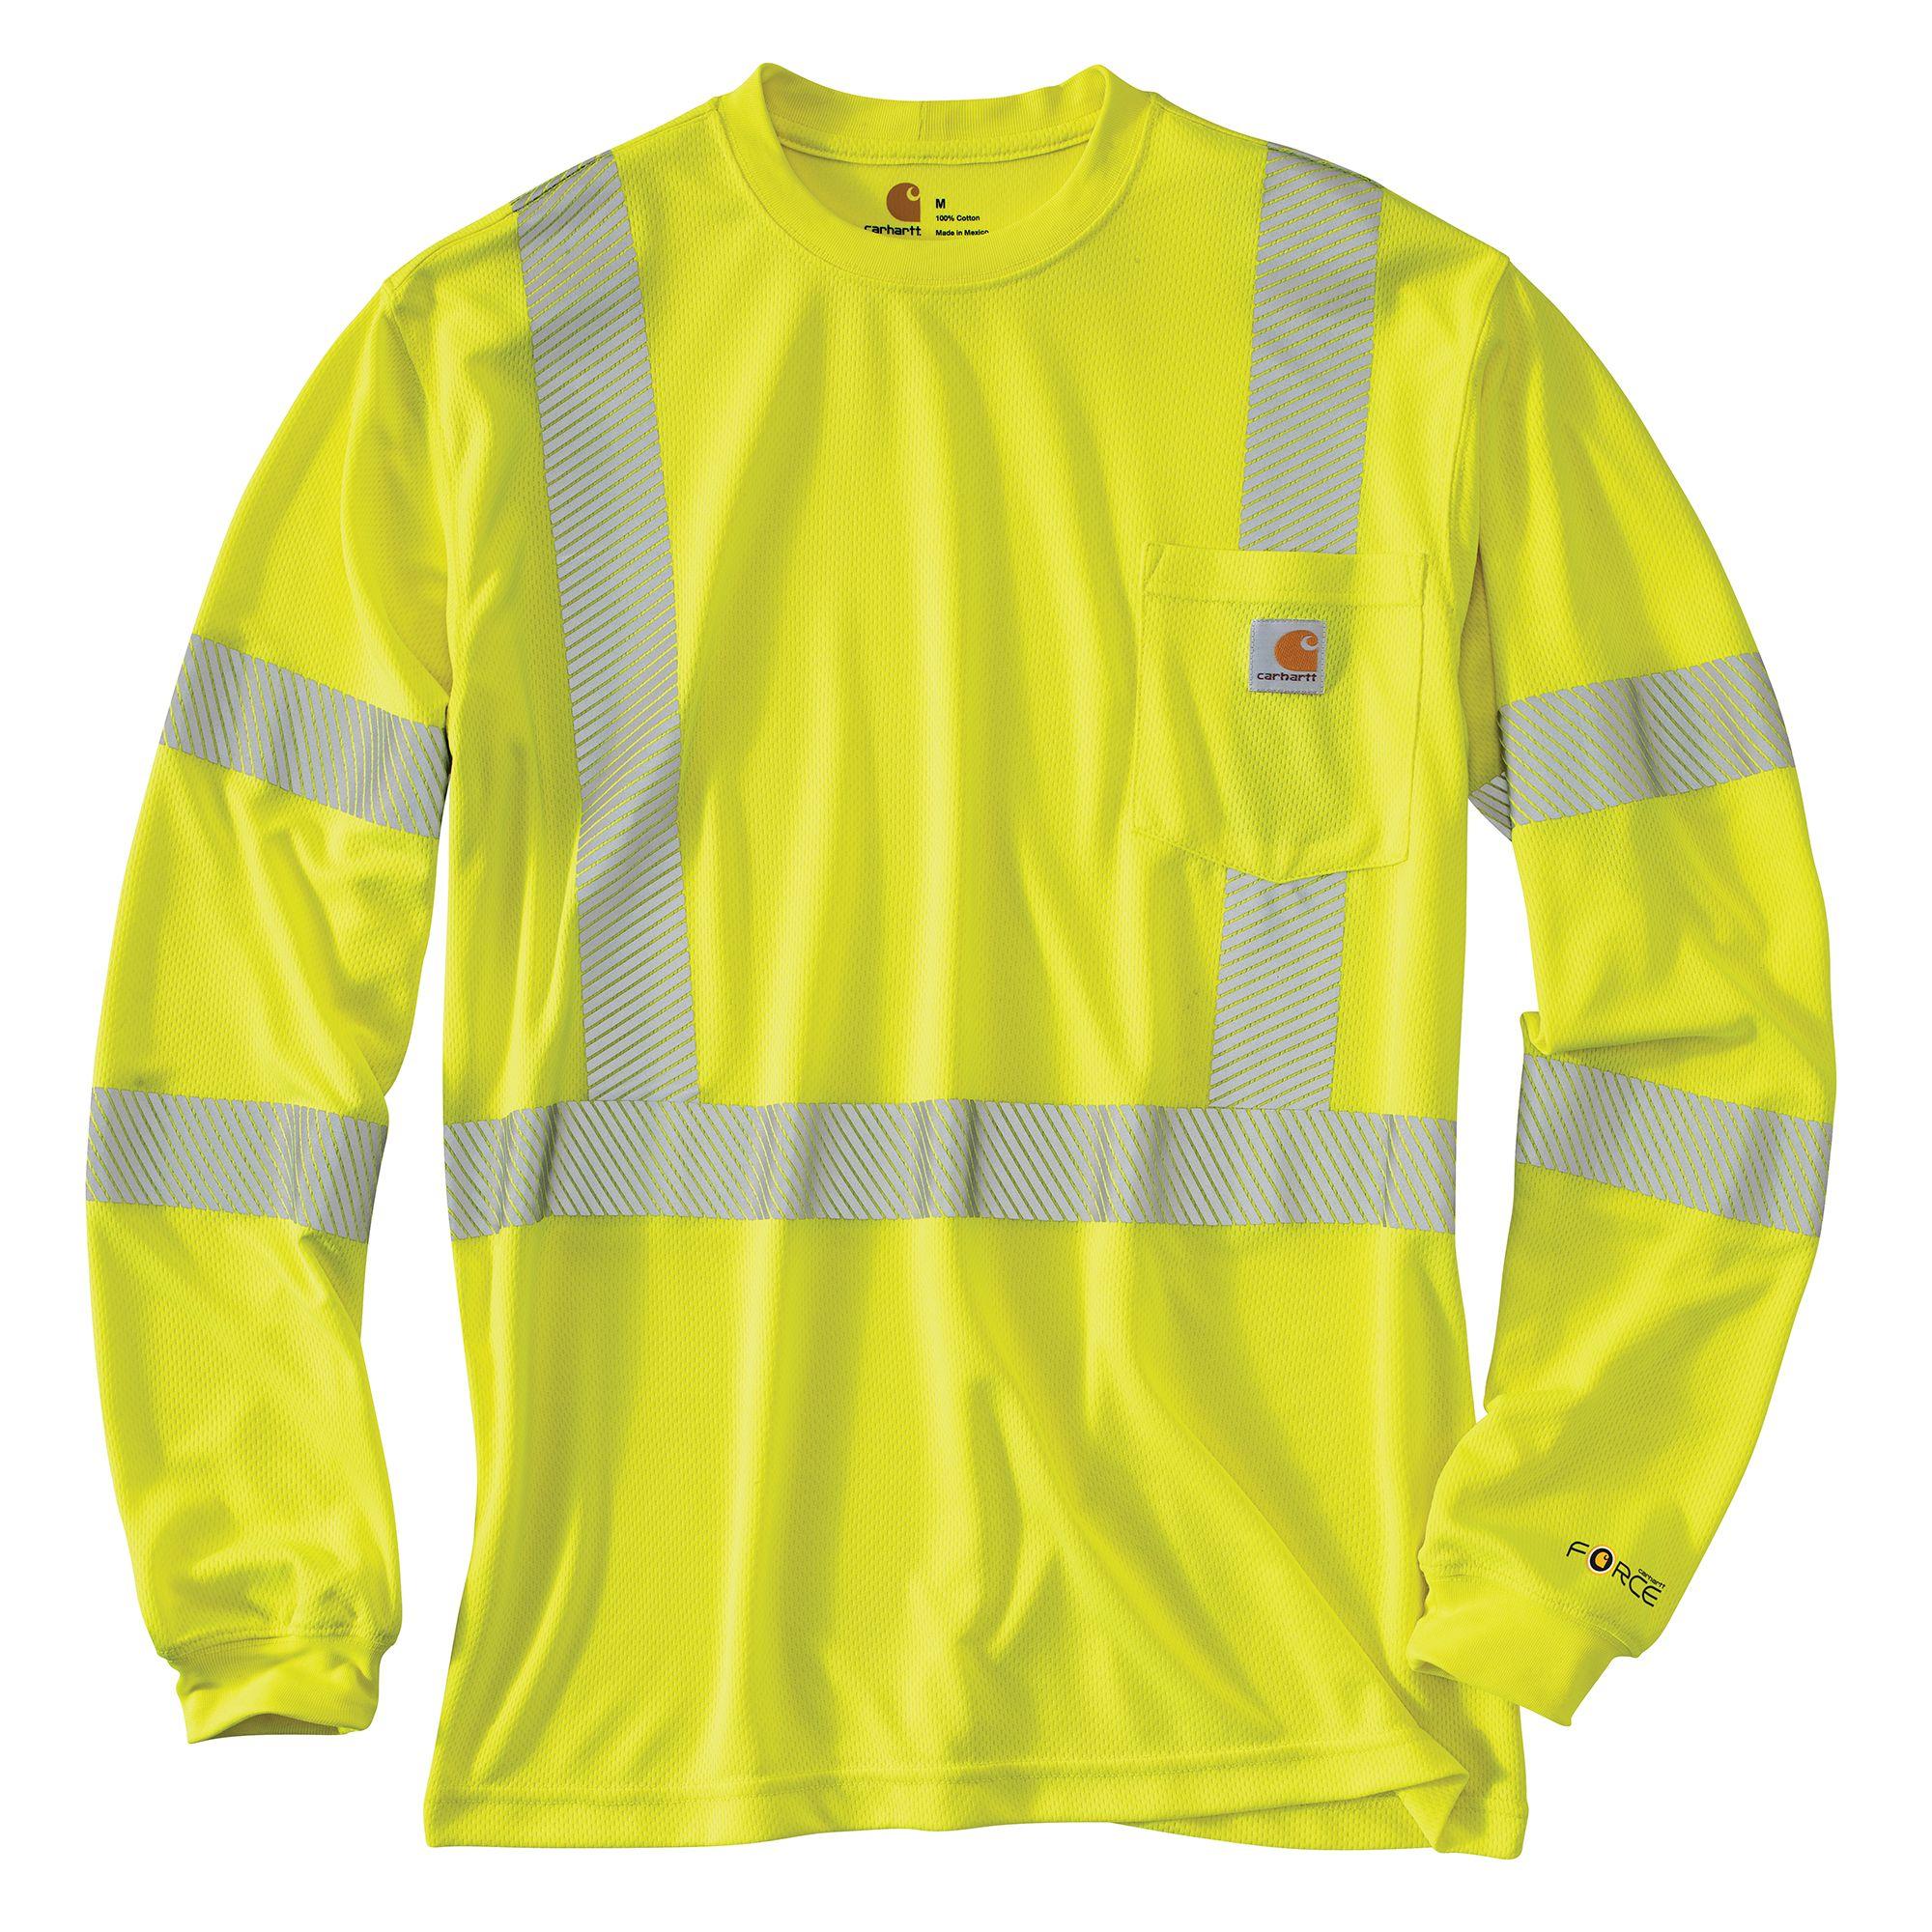 100496 Carhartt High Visibility Class 3 Reflective TShirt